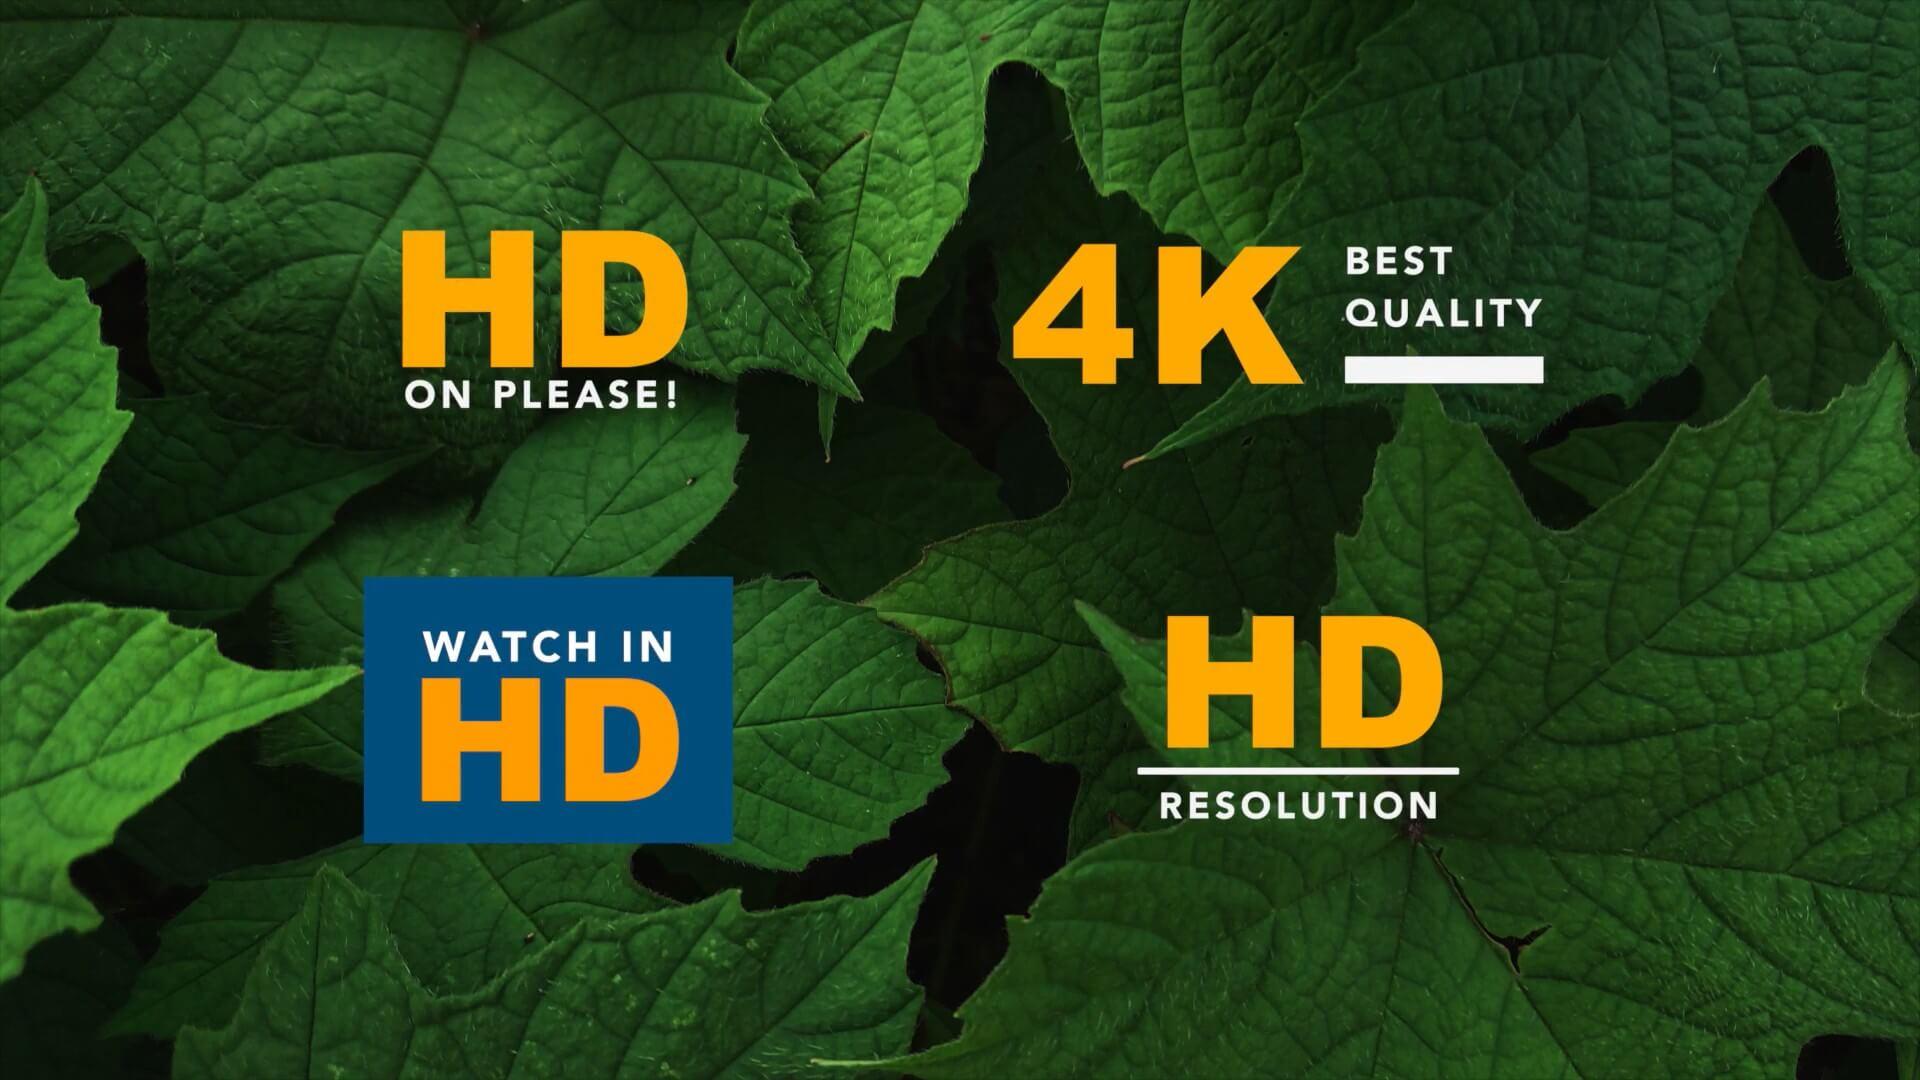 fcpx标题插件 4K分辨率标识HD角标动画 免费下载